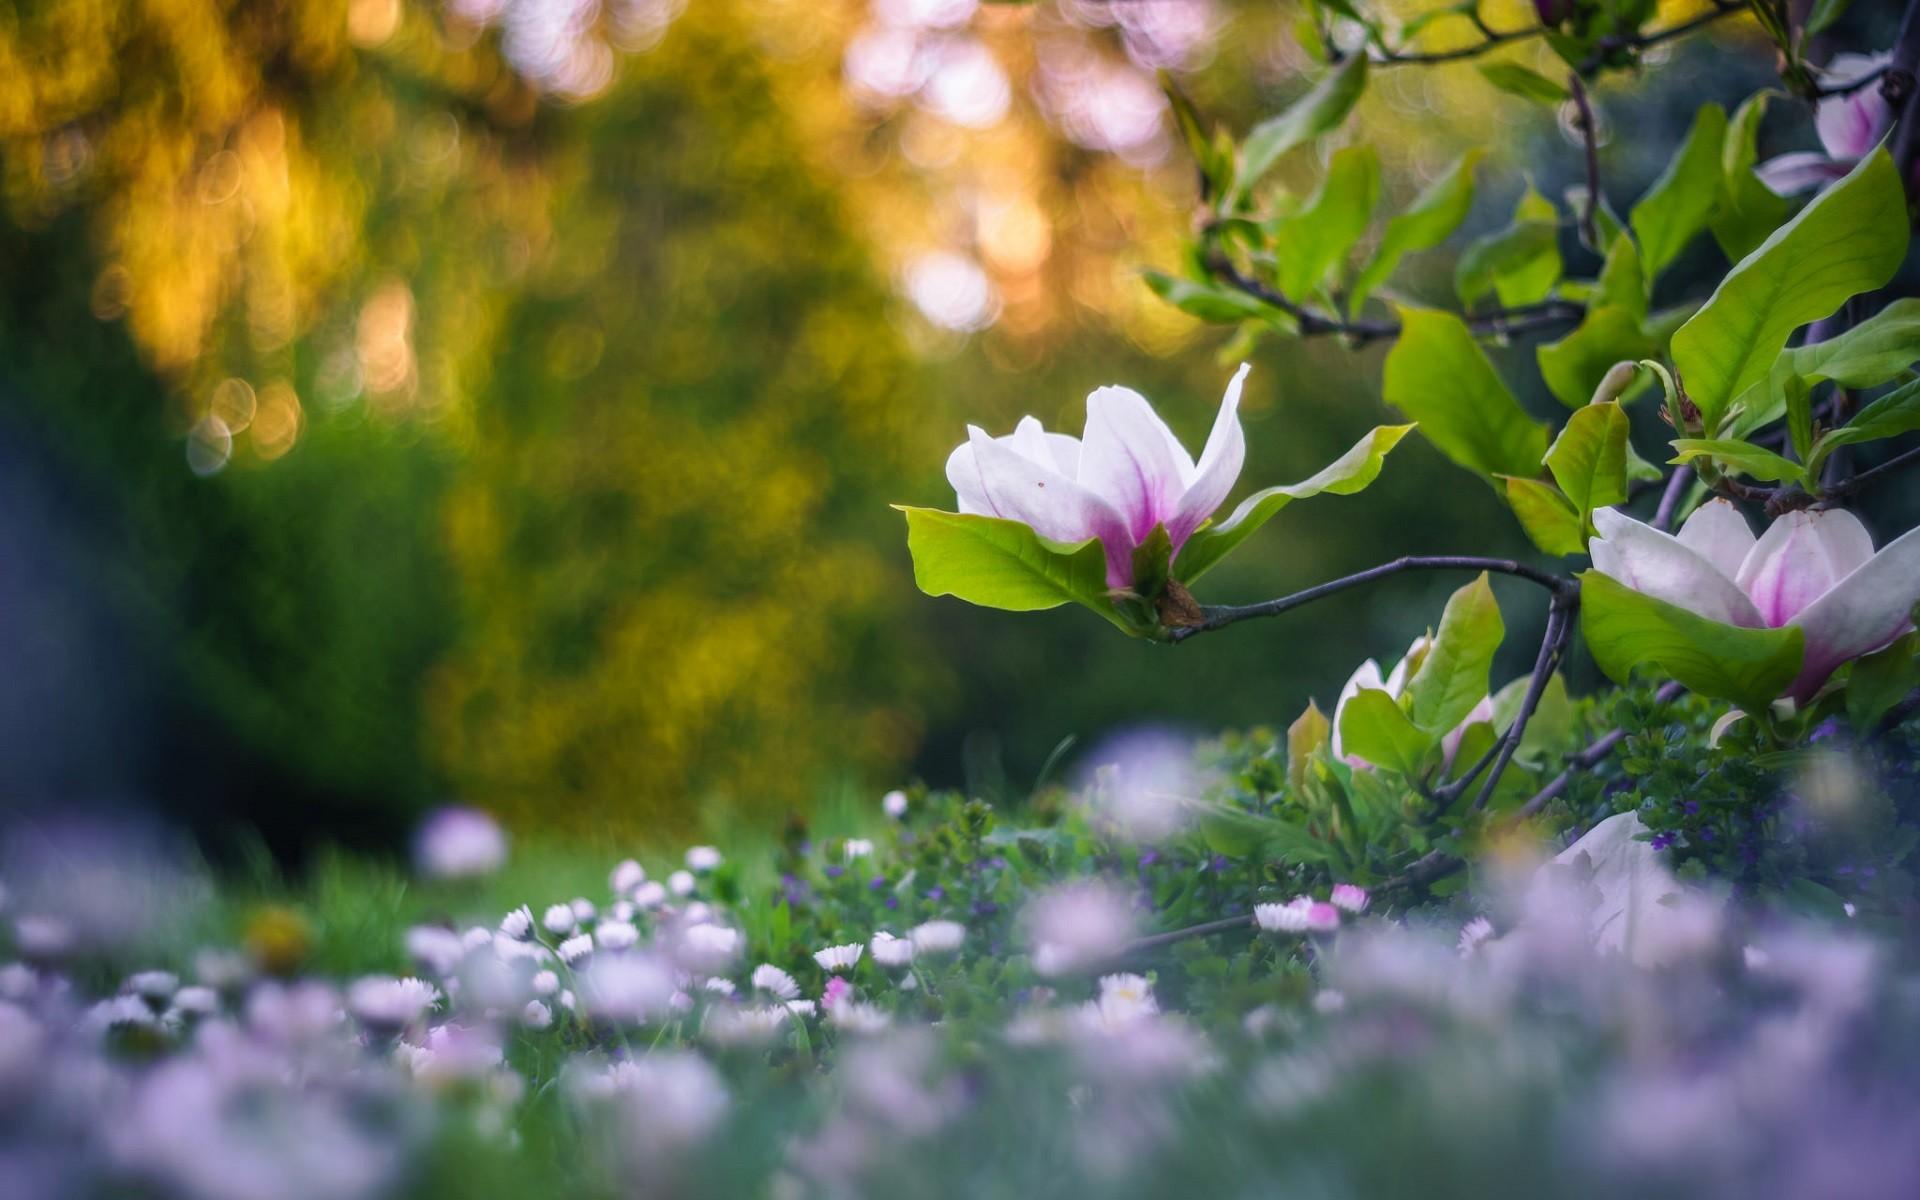 Wallpaper Sunlight Depth Of Field Flowers Garden